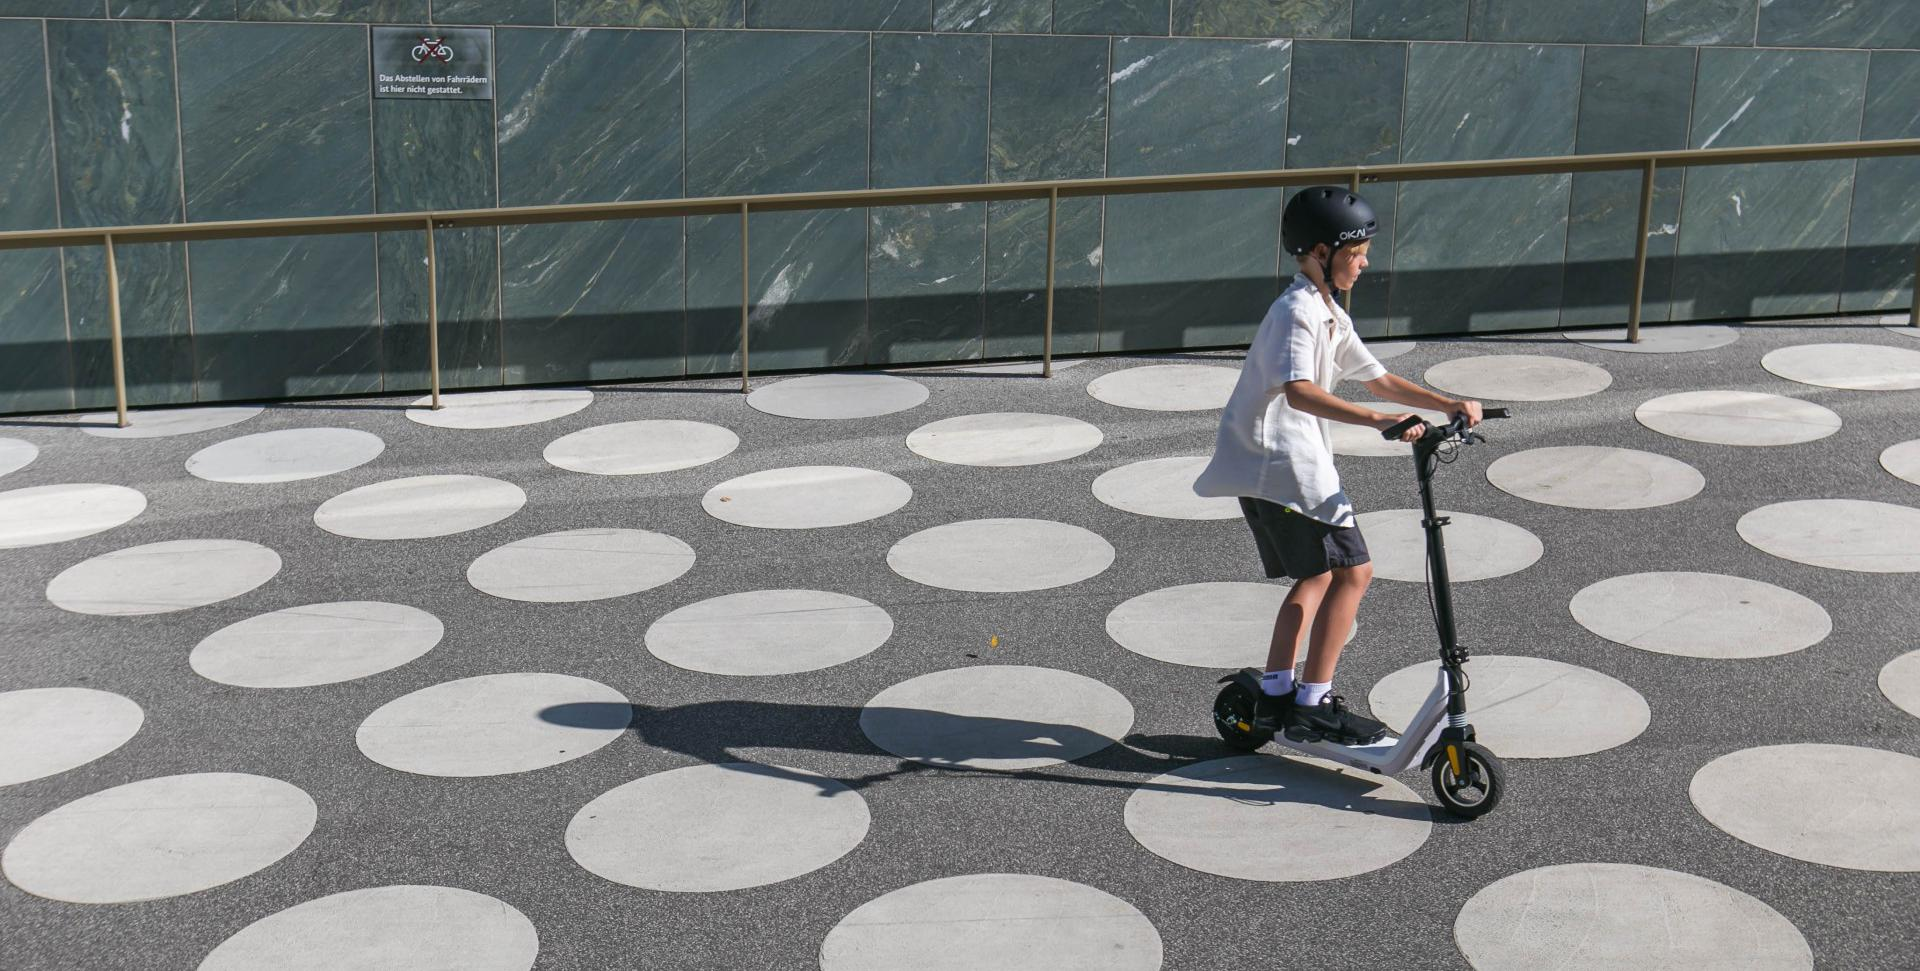 okai-electric-scooter-_-electric-bike-manufacturer-es50-3.jpg